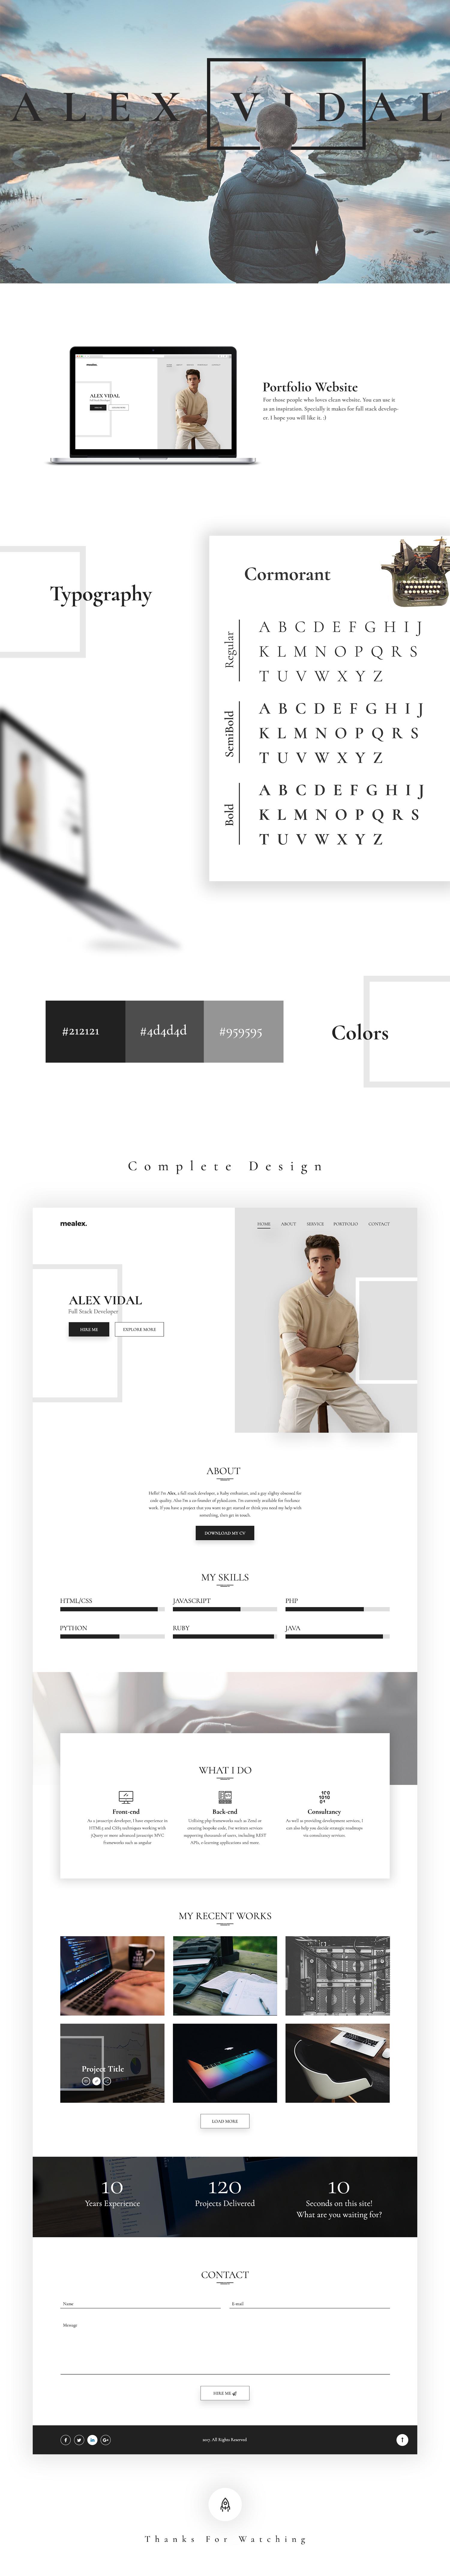 Alex Free Personal Portfolio And Resume Psd Template